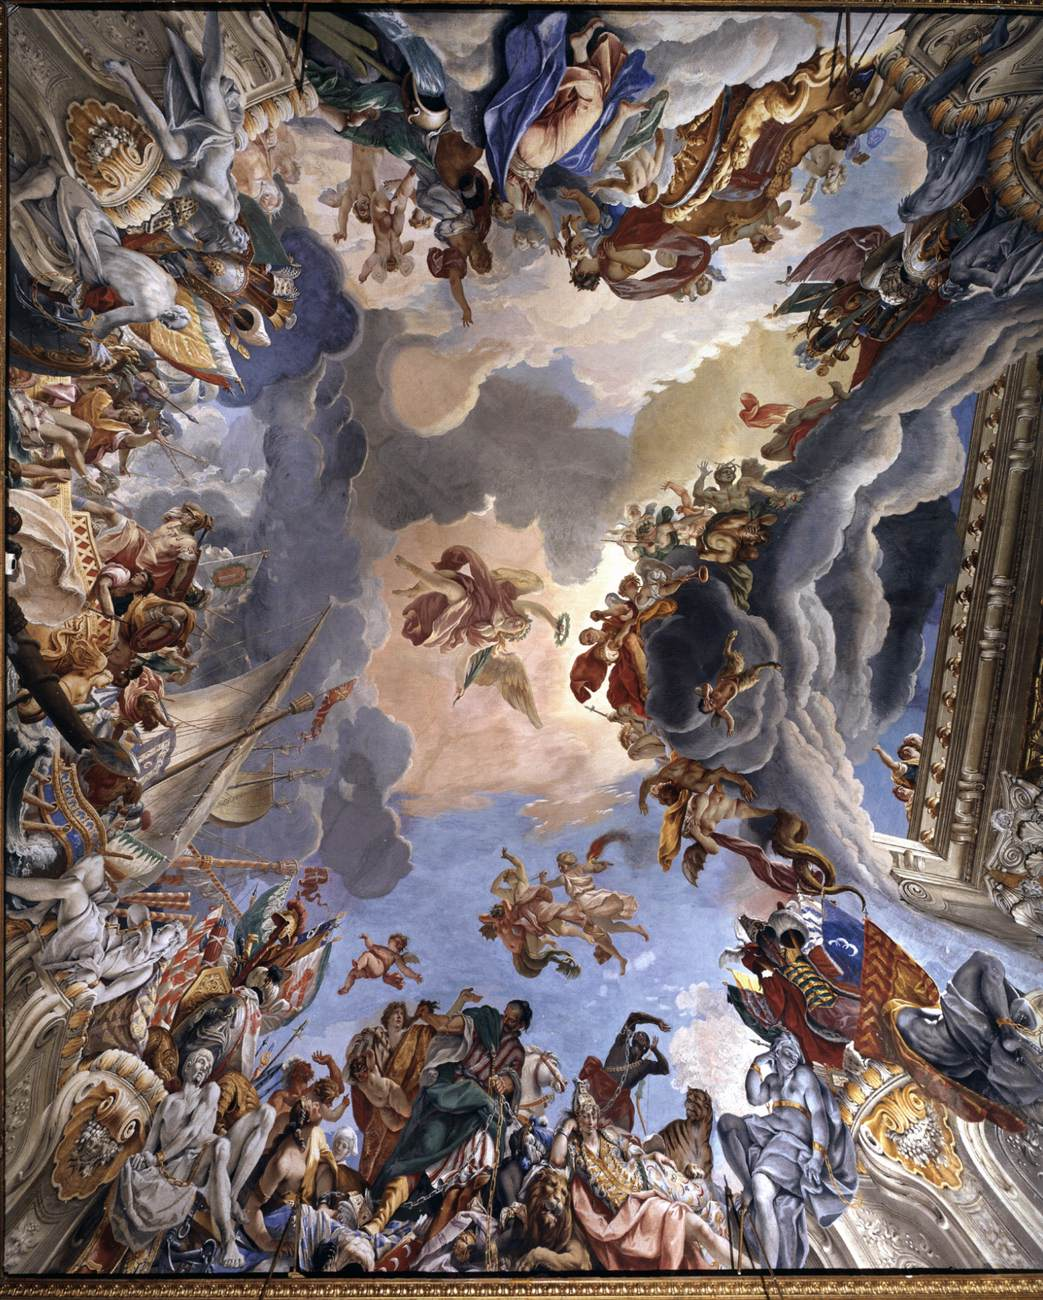 Sebastiano Ricci, (1659 Belluno - 1734 Venetië), Allegorie van Marcantonio Colonna's overwinning bij Lepanto, 1693-95, Palazzo Colonna, Rome